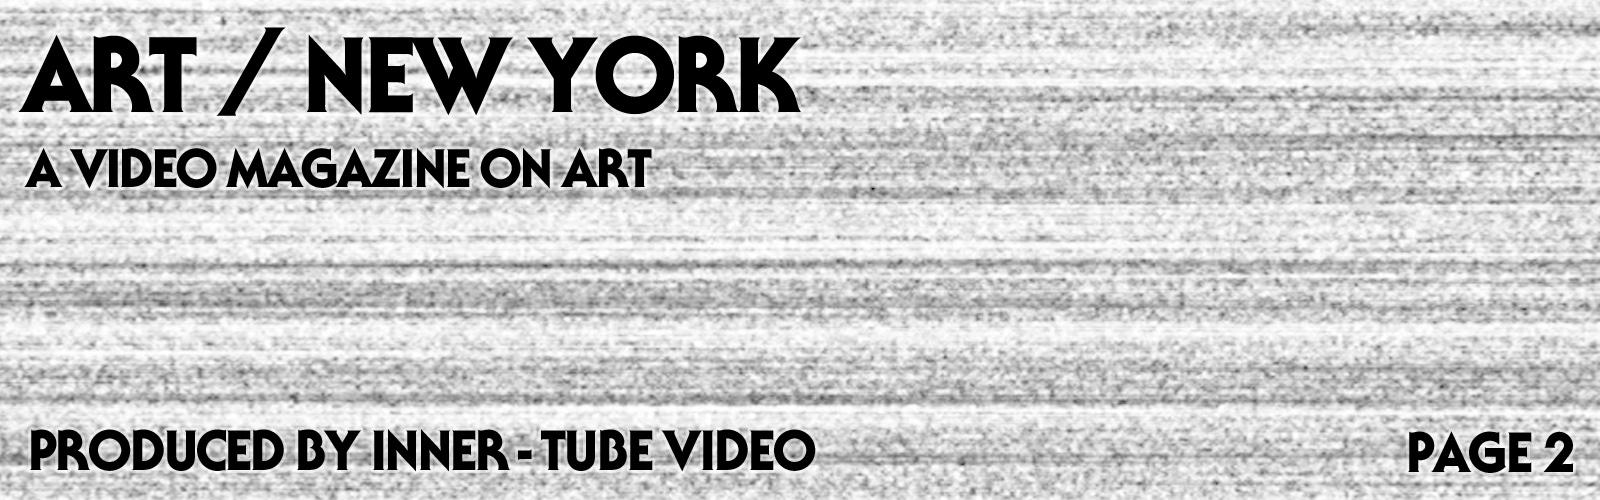 art-newyork-cover-page2.jpg